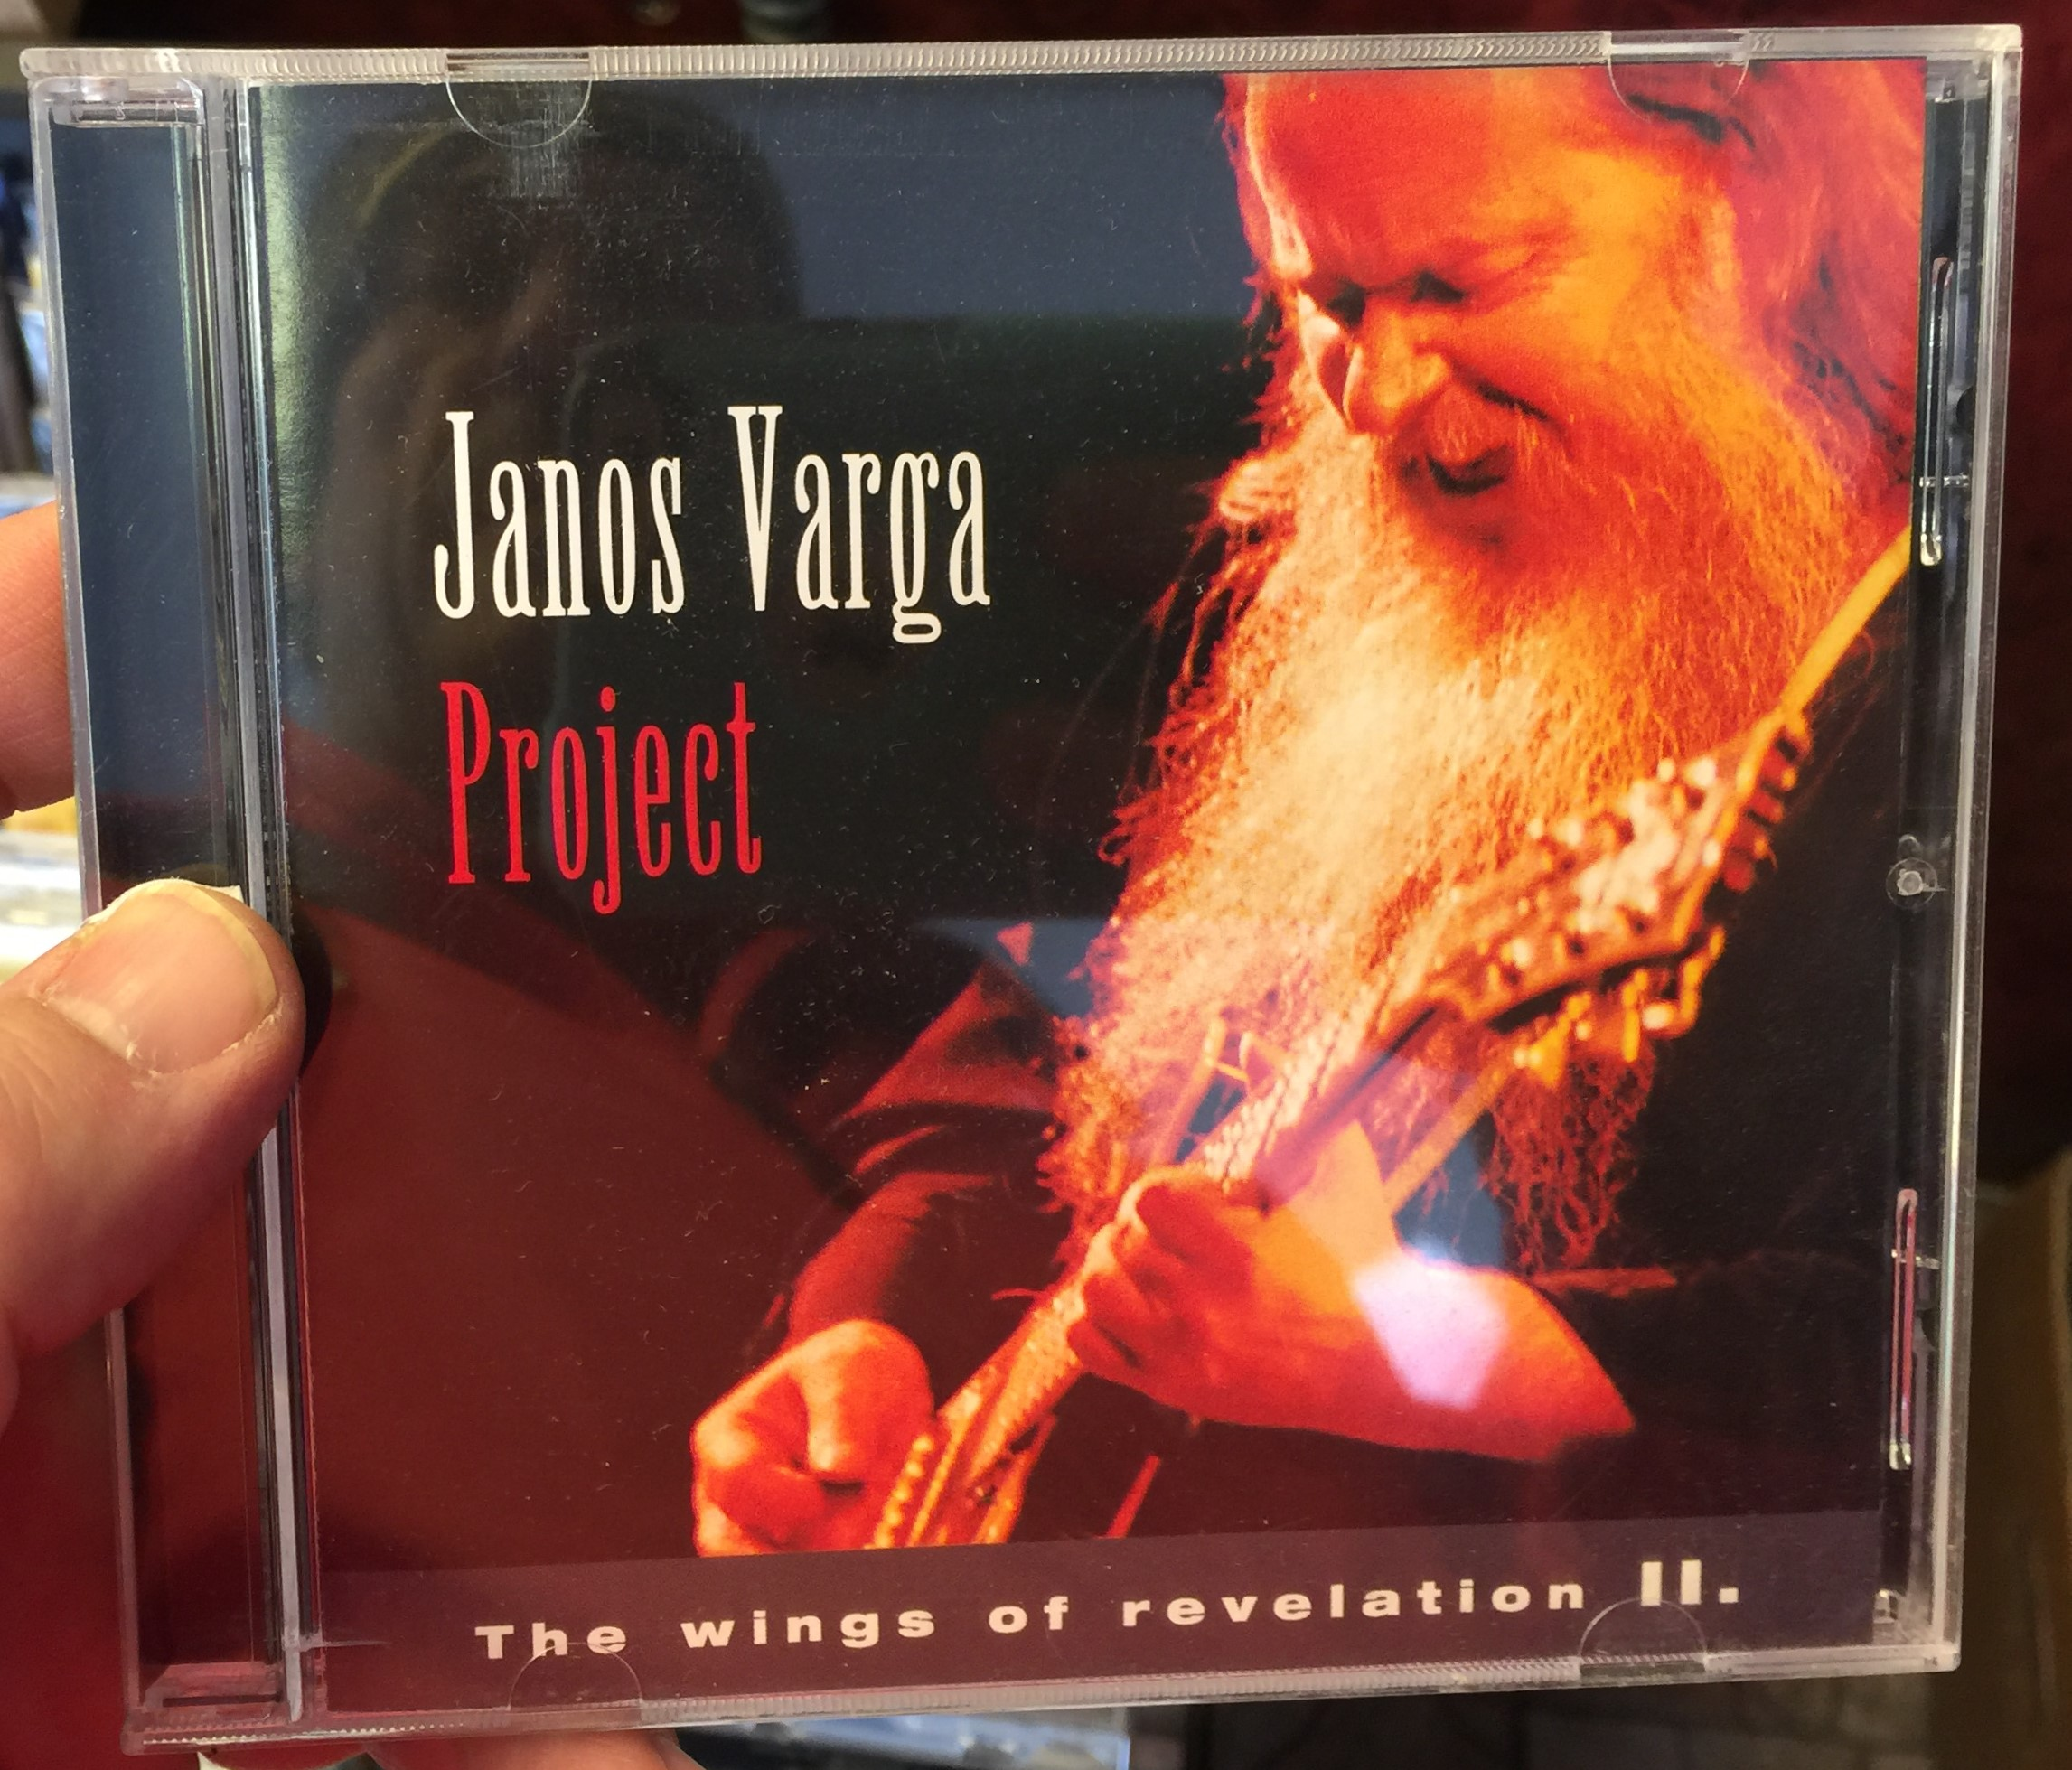 janos-varga-project-the-wings-of-revelation-ii.-periferic-records-audio-cd-2002-bgcd-114-1-.jpg